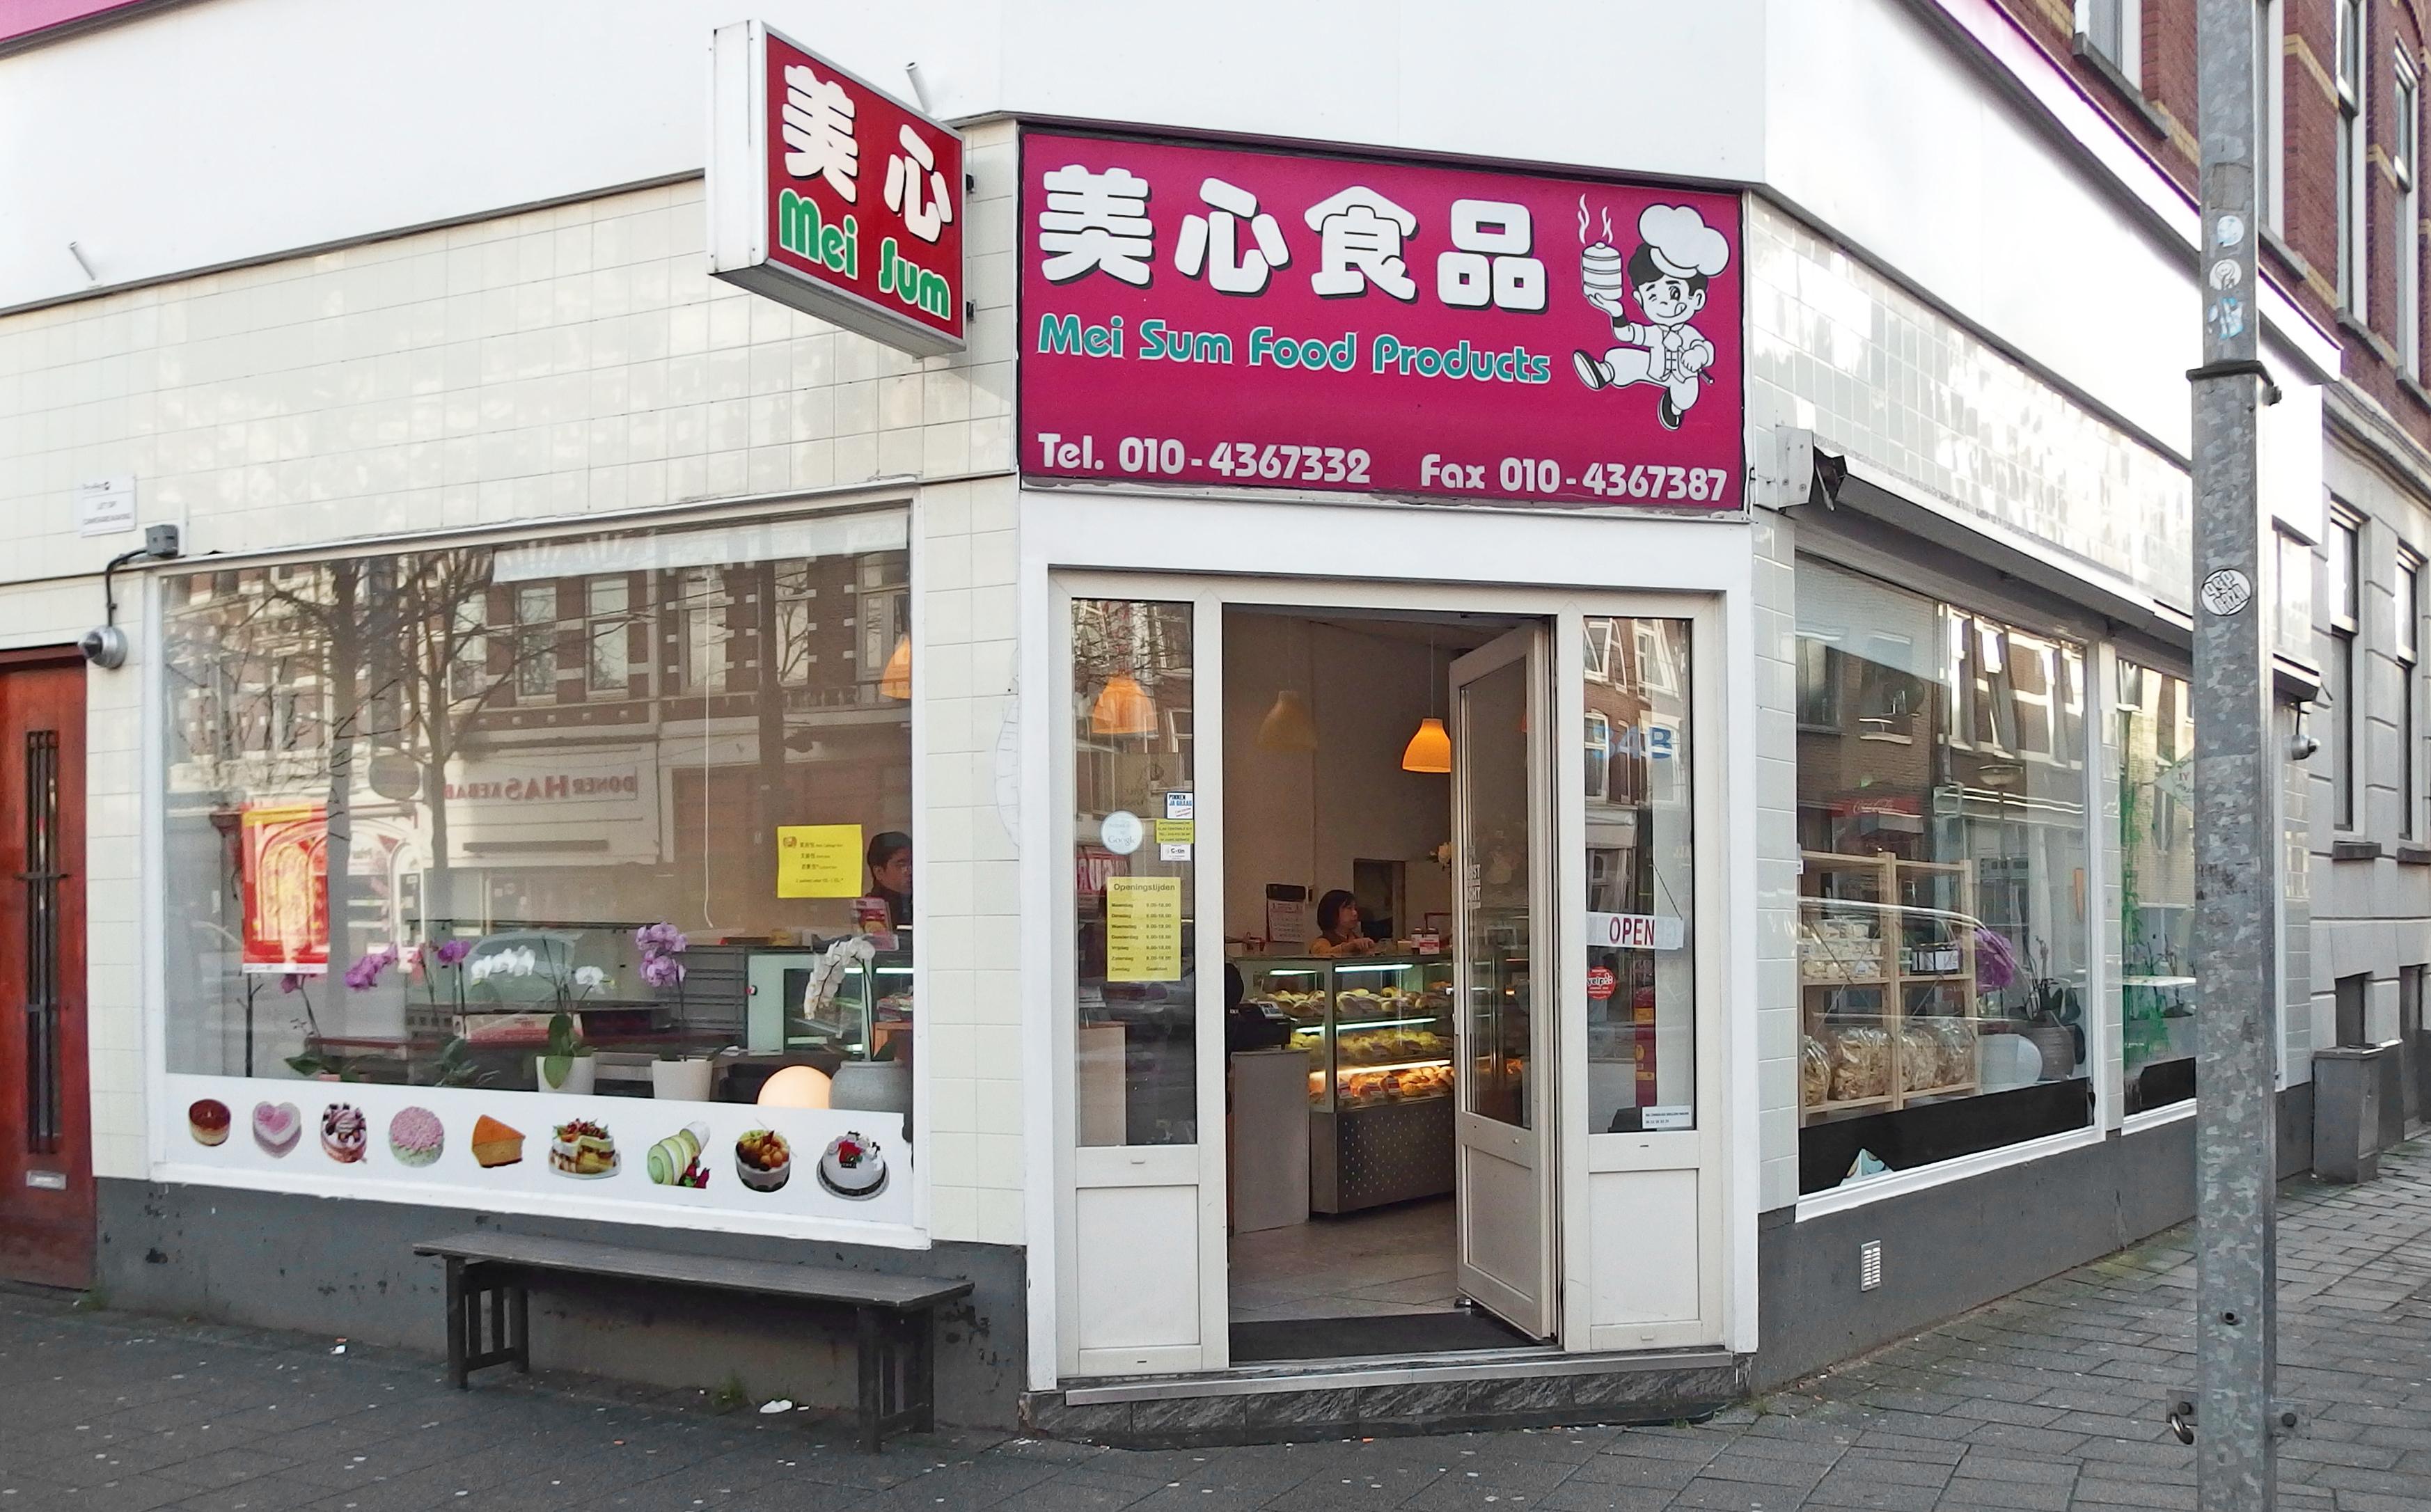 Winkels aziatische ingredi for Baklava bestellen rotterdam